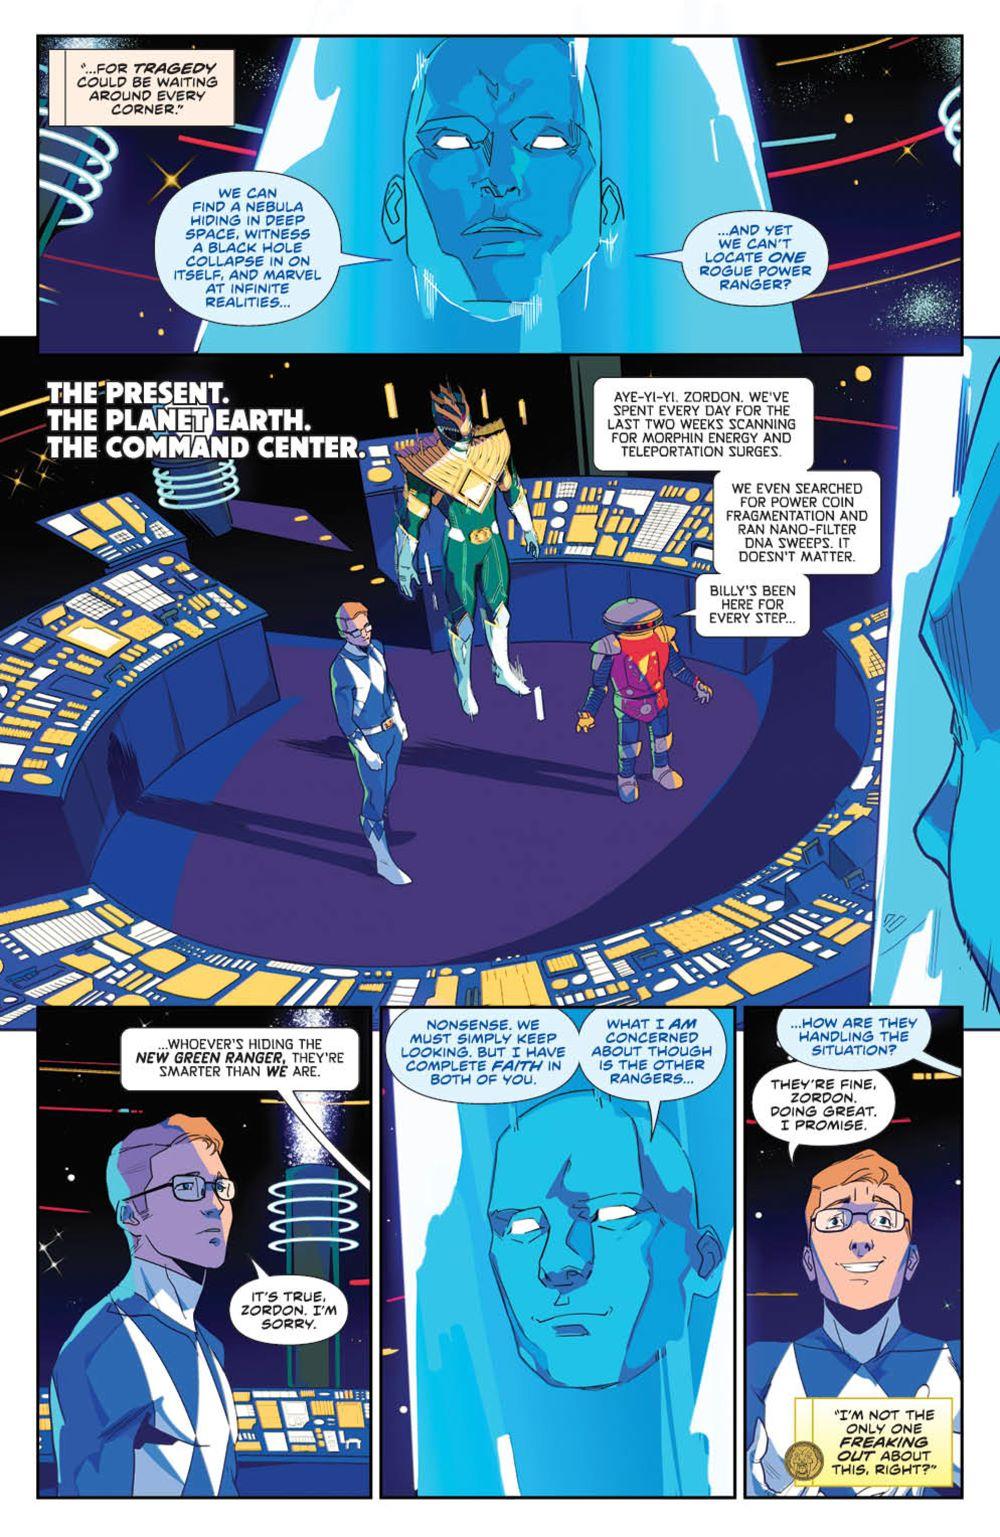 MightyMorphin_v1_SC_PRESS_11 ComicList Previews: MIGHTY MORPHIN VOLUME 1 TP